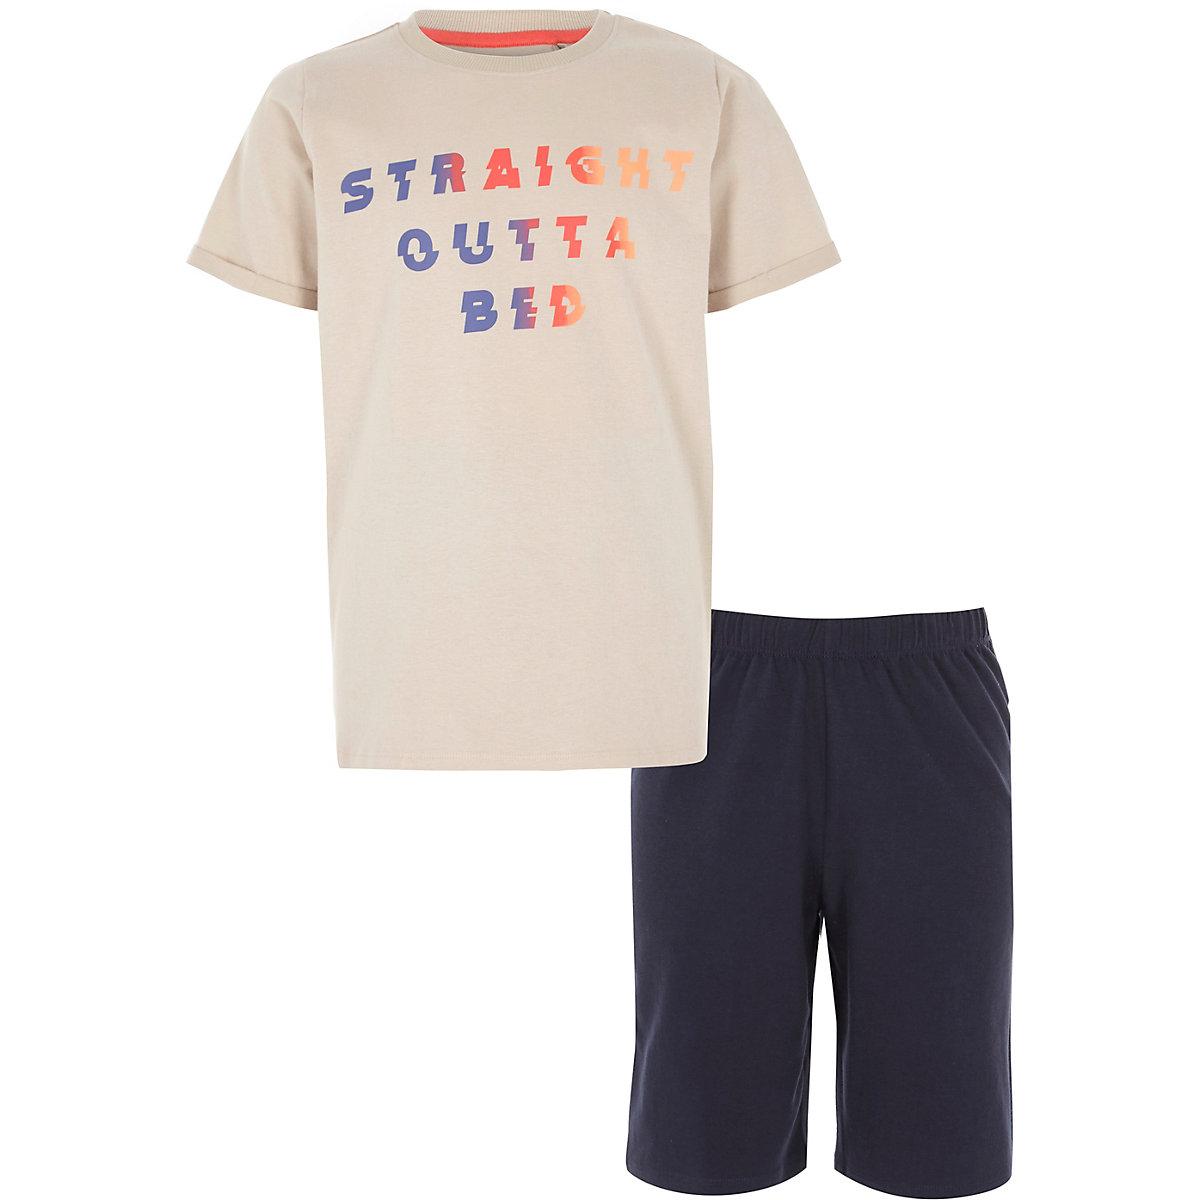 Boys stone 'straight outta bed' pyjama set